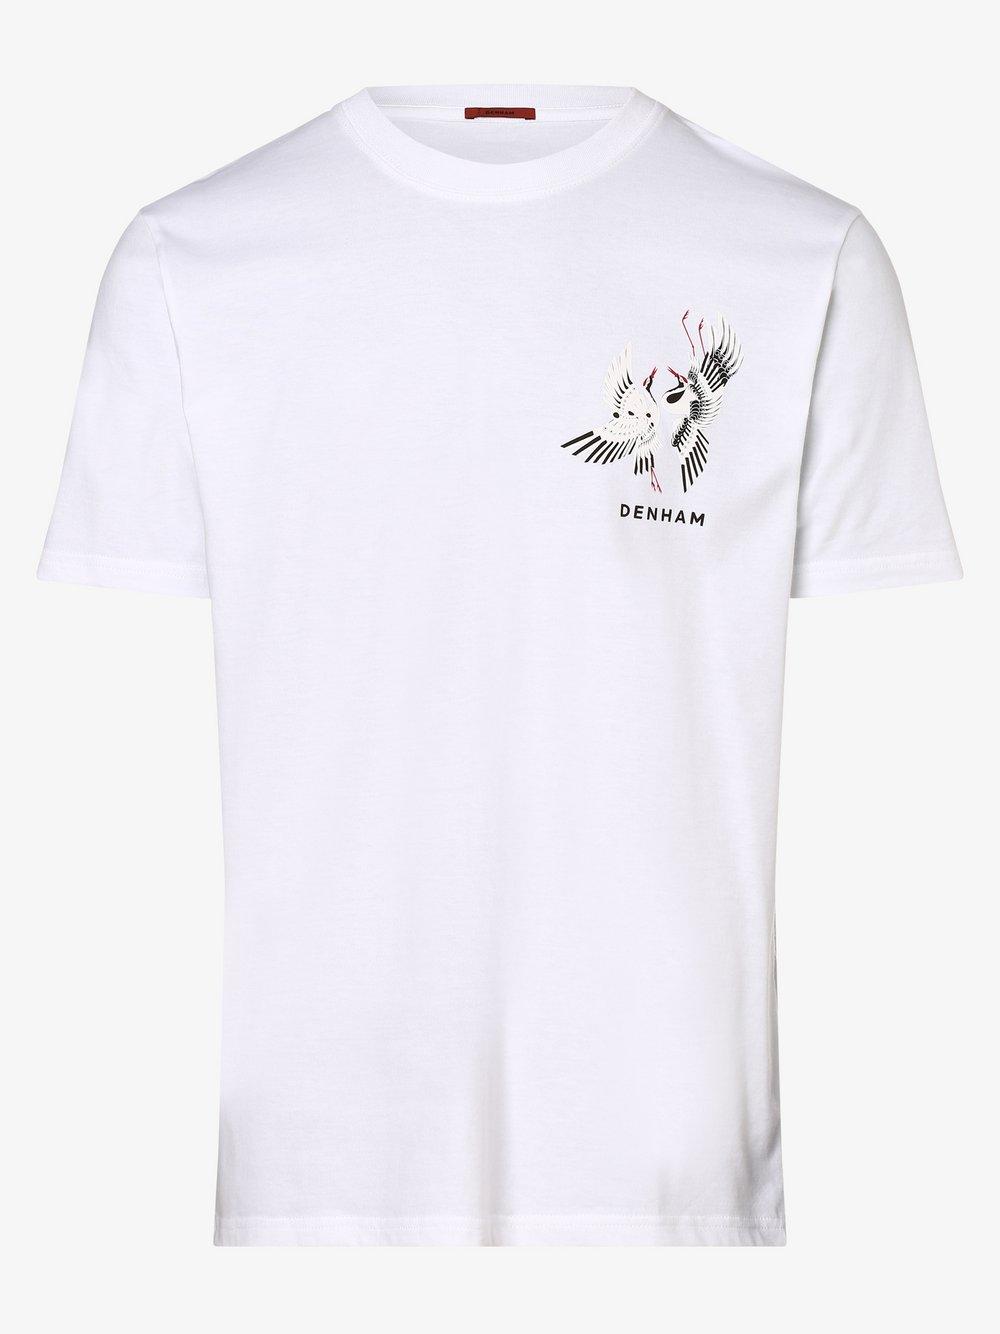 DENHAM – T-shirt męski, biały Van Graaf 473190-0001-09970